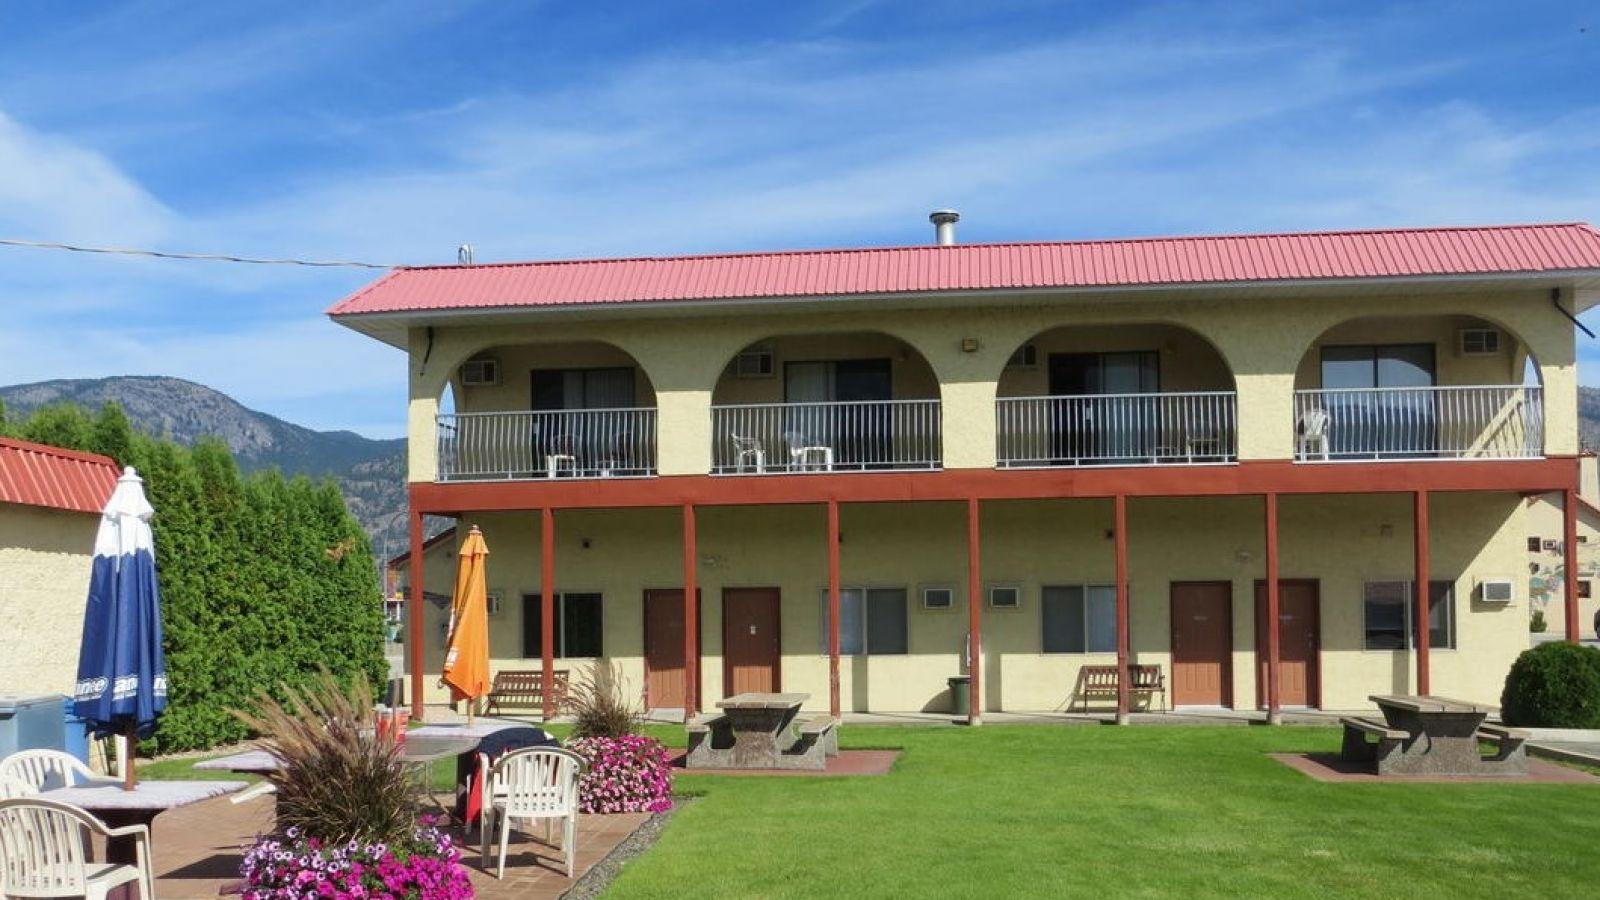 Osoyoos Westridge Motor Inn Golf Stay and Play